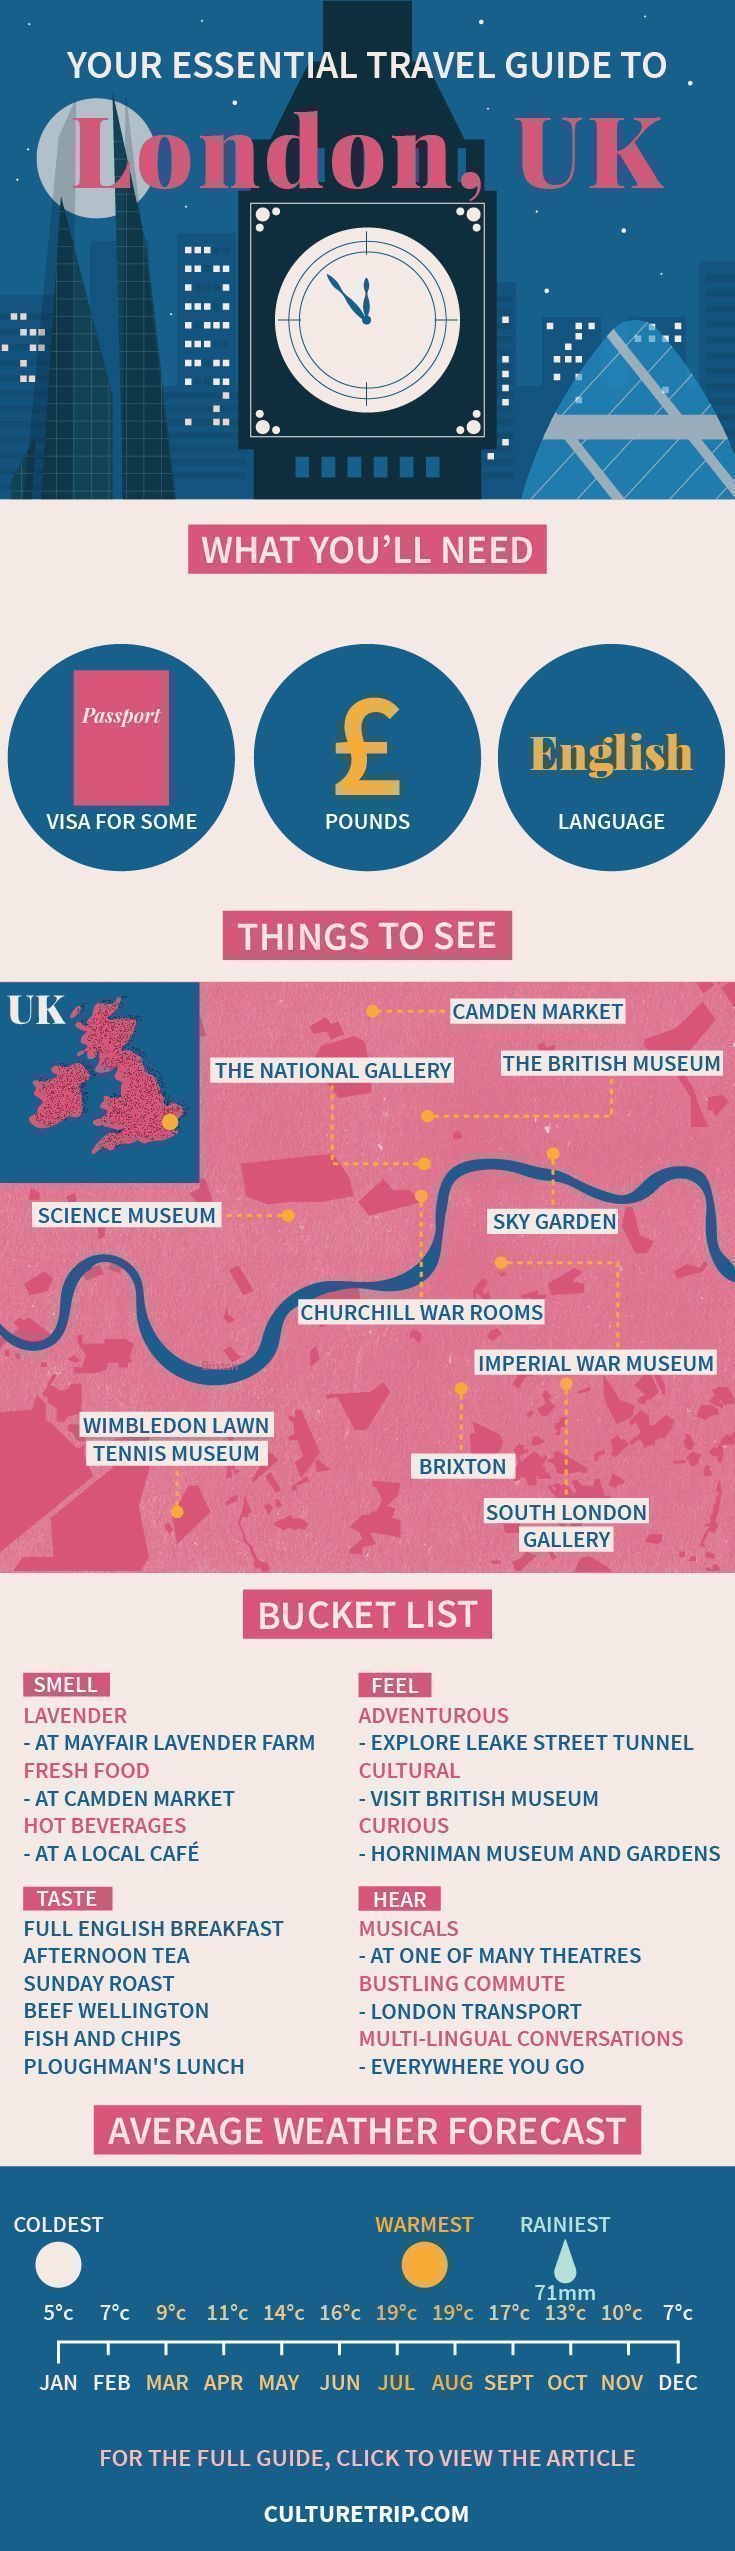 Your Essential Travel Guide to London (Infographic)   London, England, weekend break, Europe, bucket list, wanderlust, adventure, challenge, coffee, bar, food, must try, Summer, United Kingdom, UK #travelinfographic #londontravel #coffeebreak